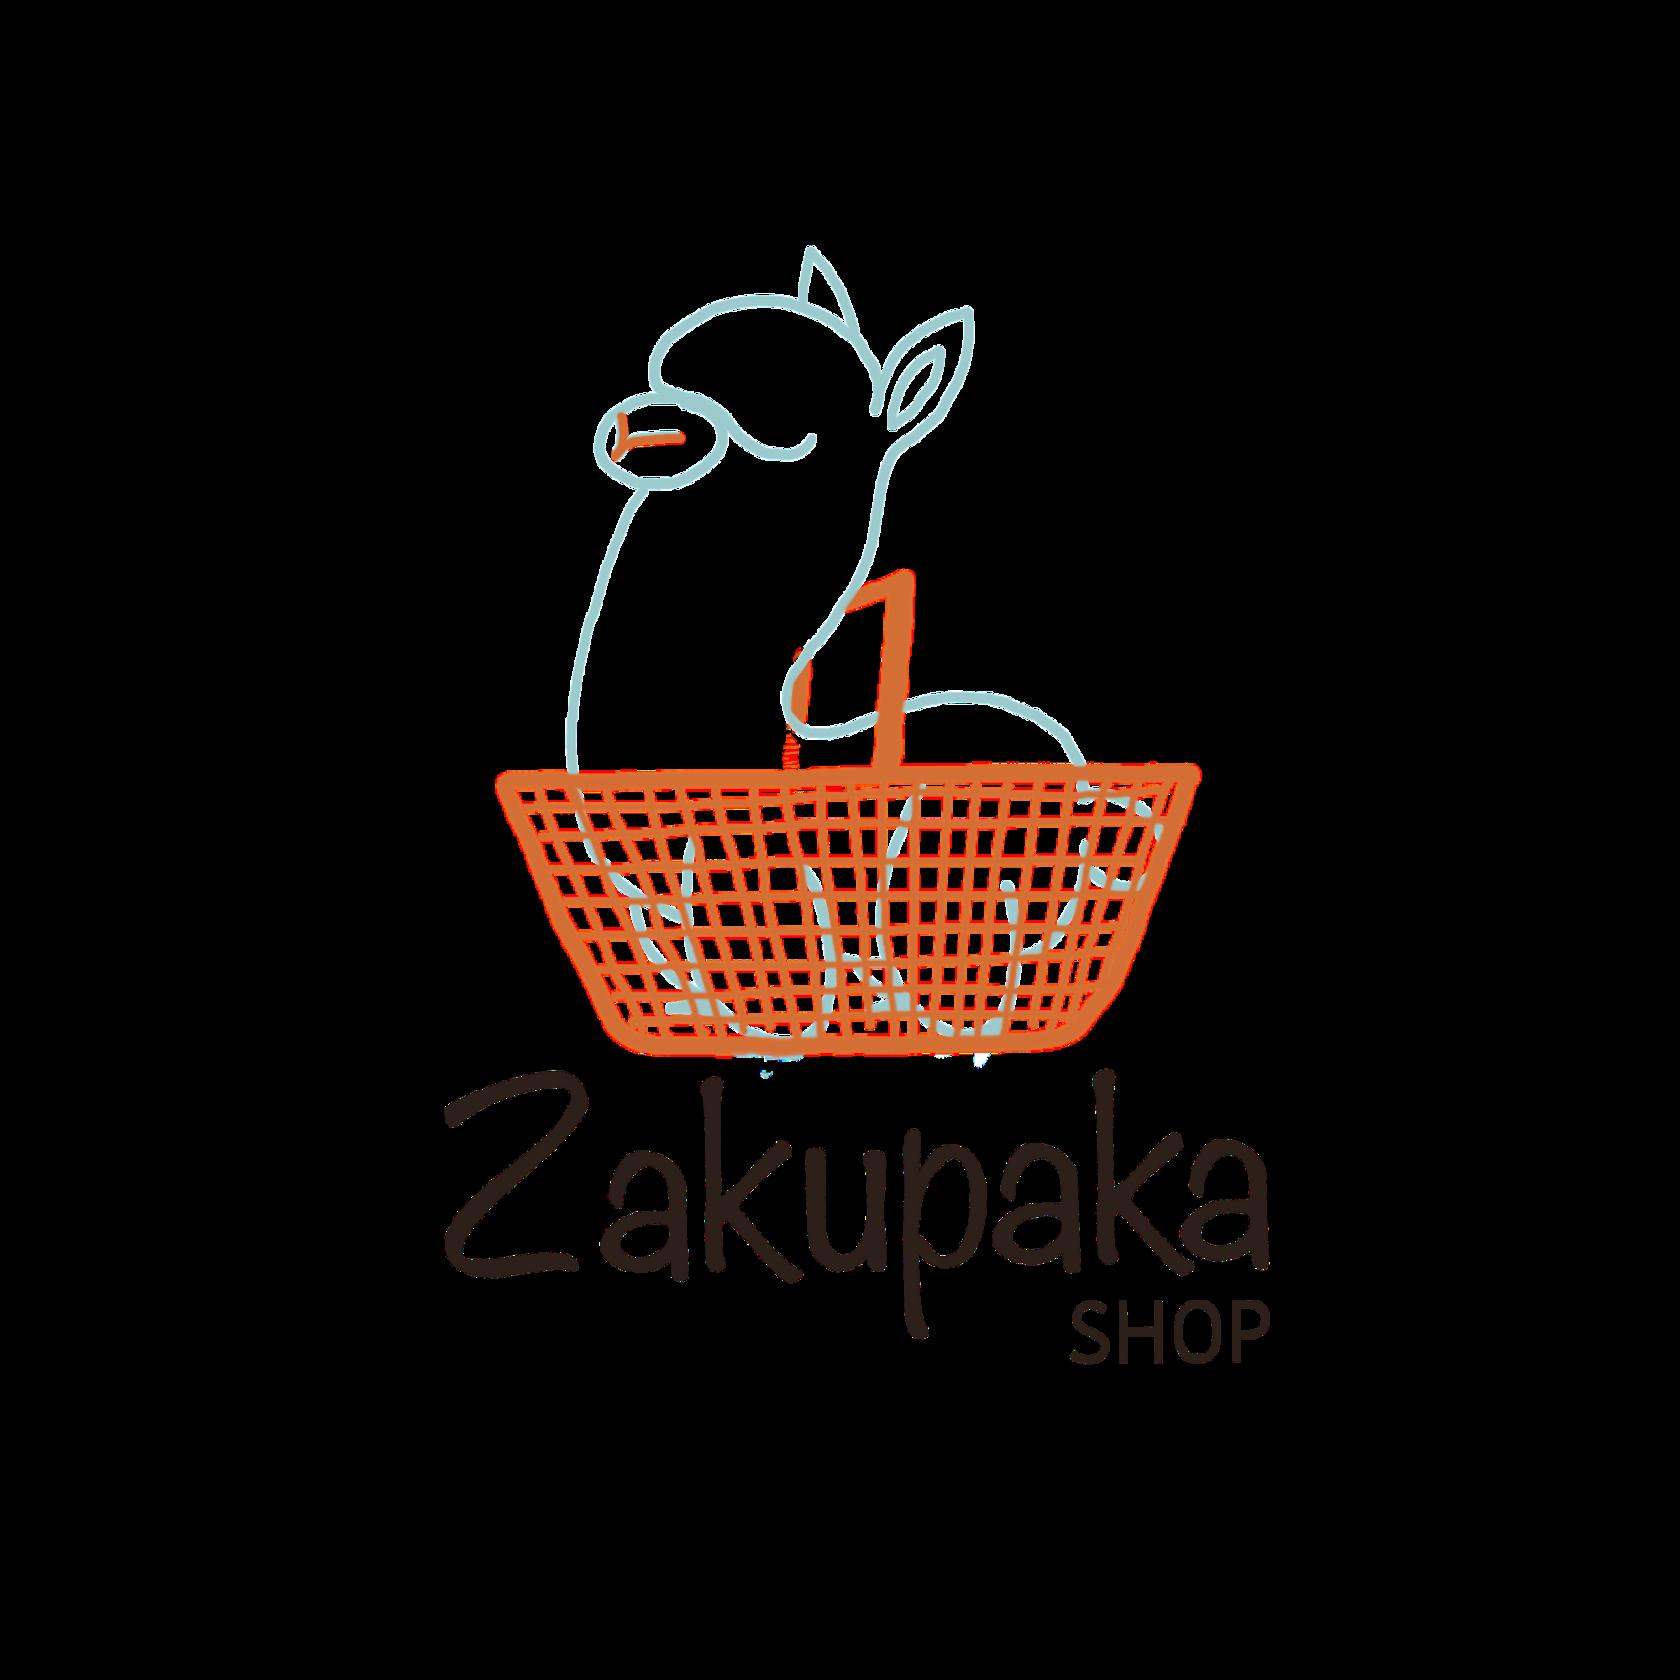 Zakupaka.shop